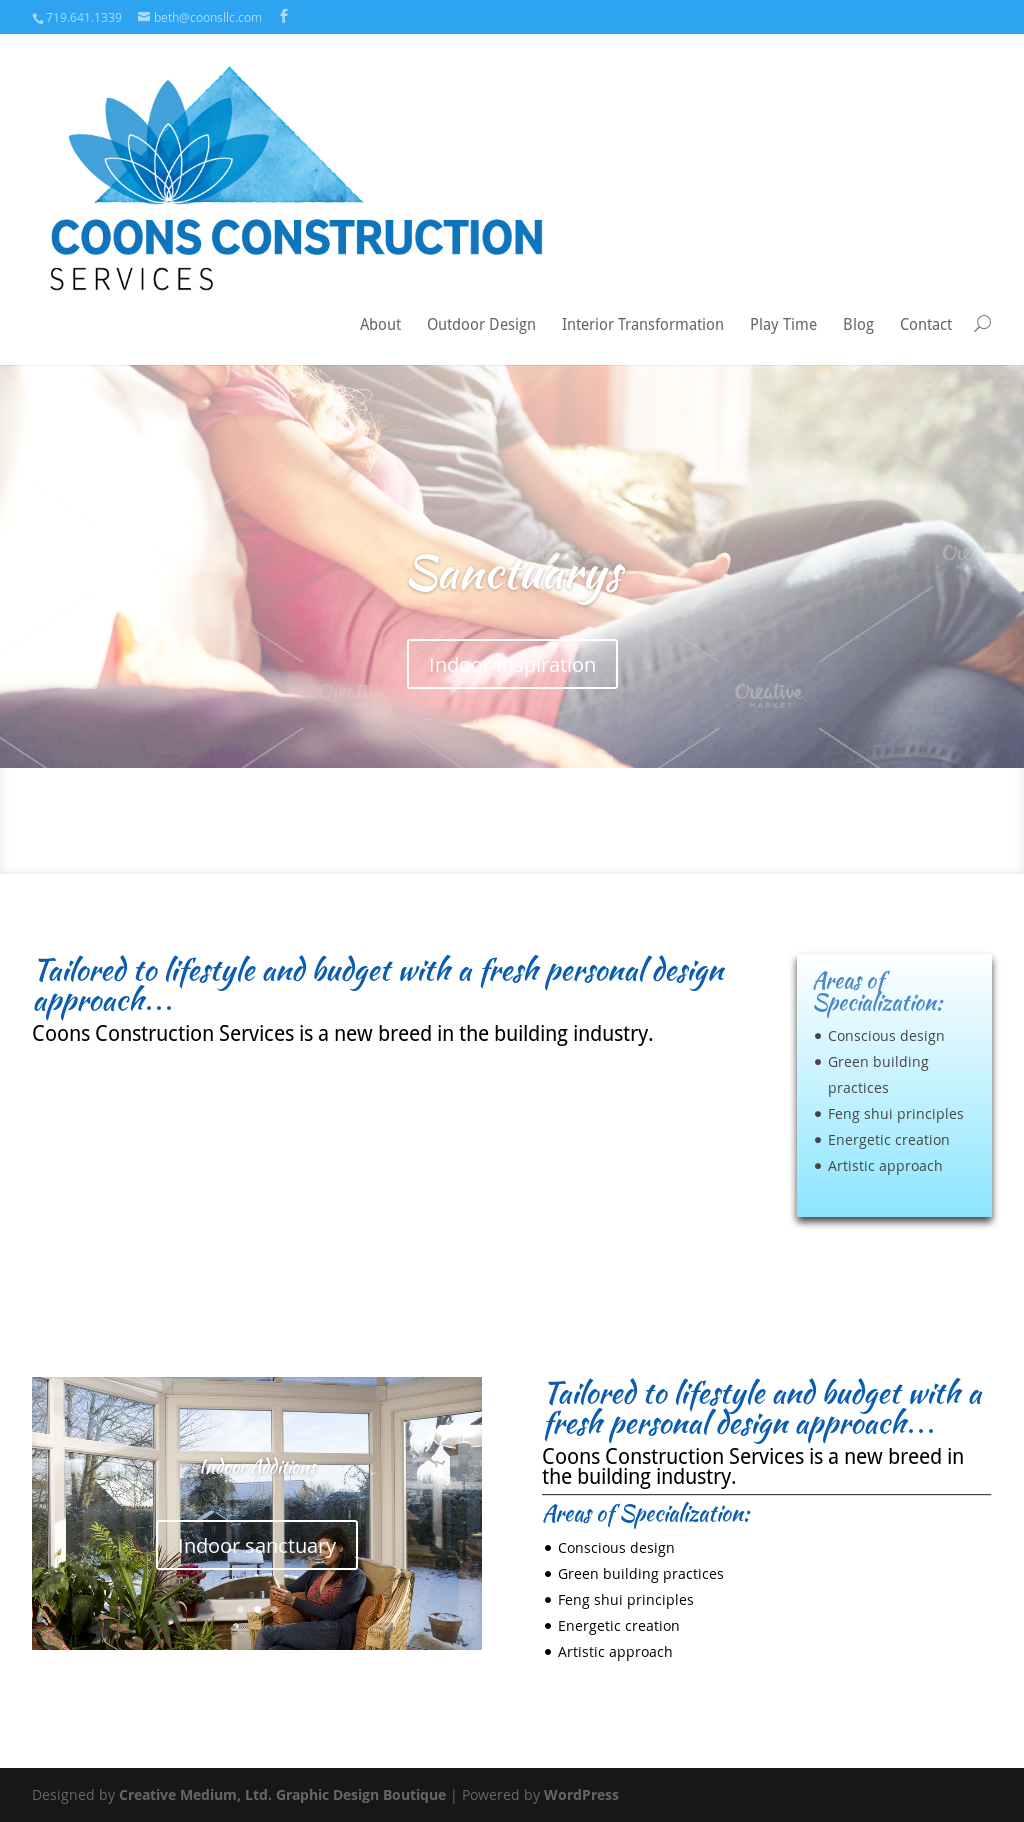 construction services company profile pdf